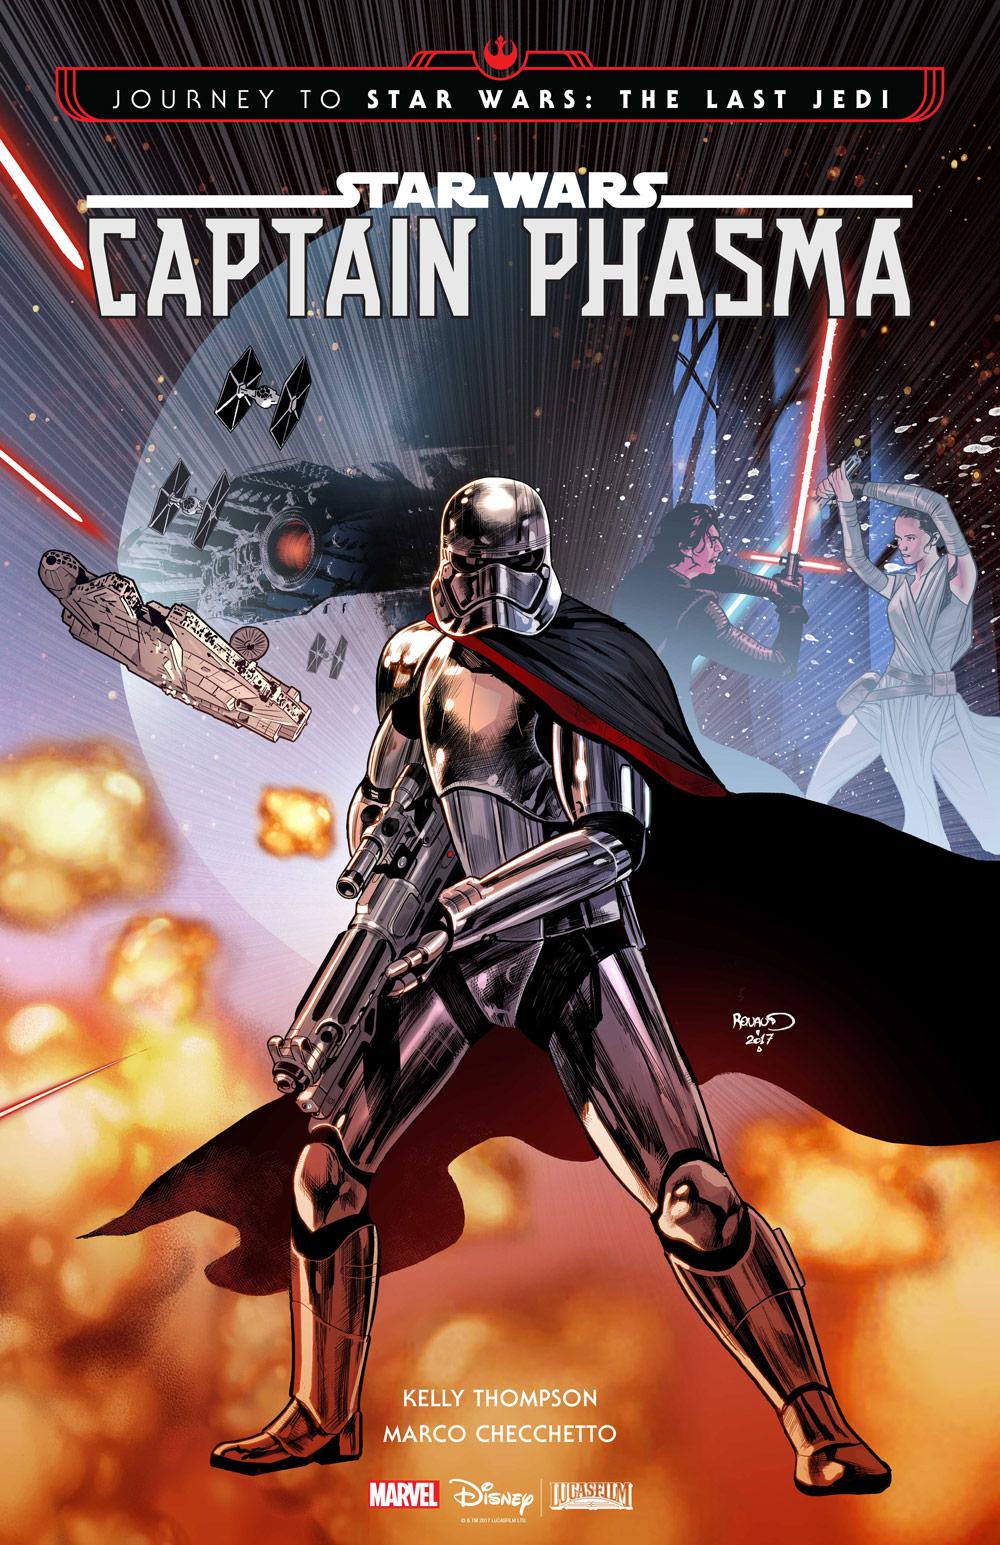 Captain-phasma-1-cover.jpg